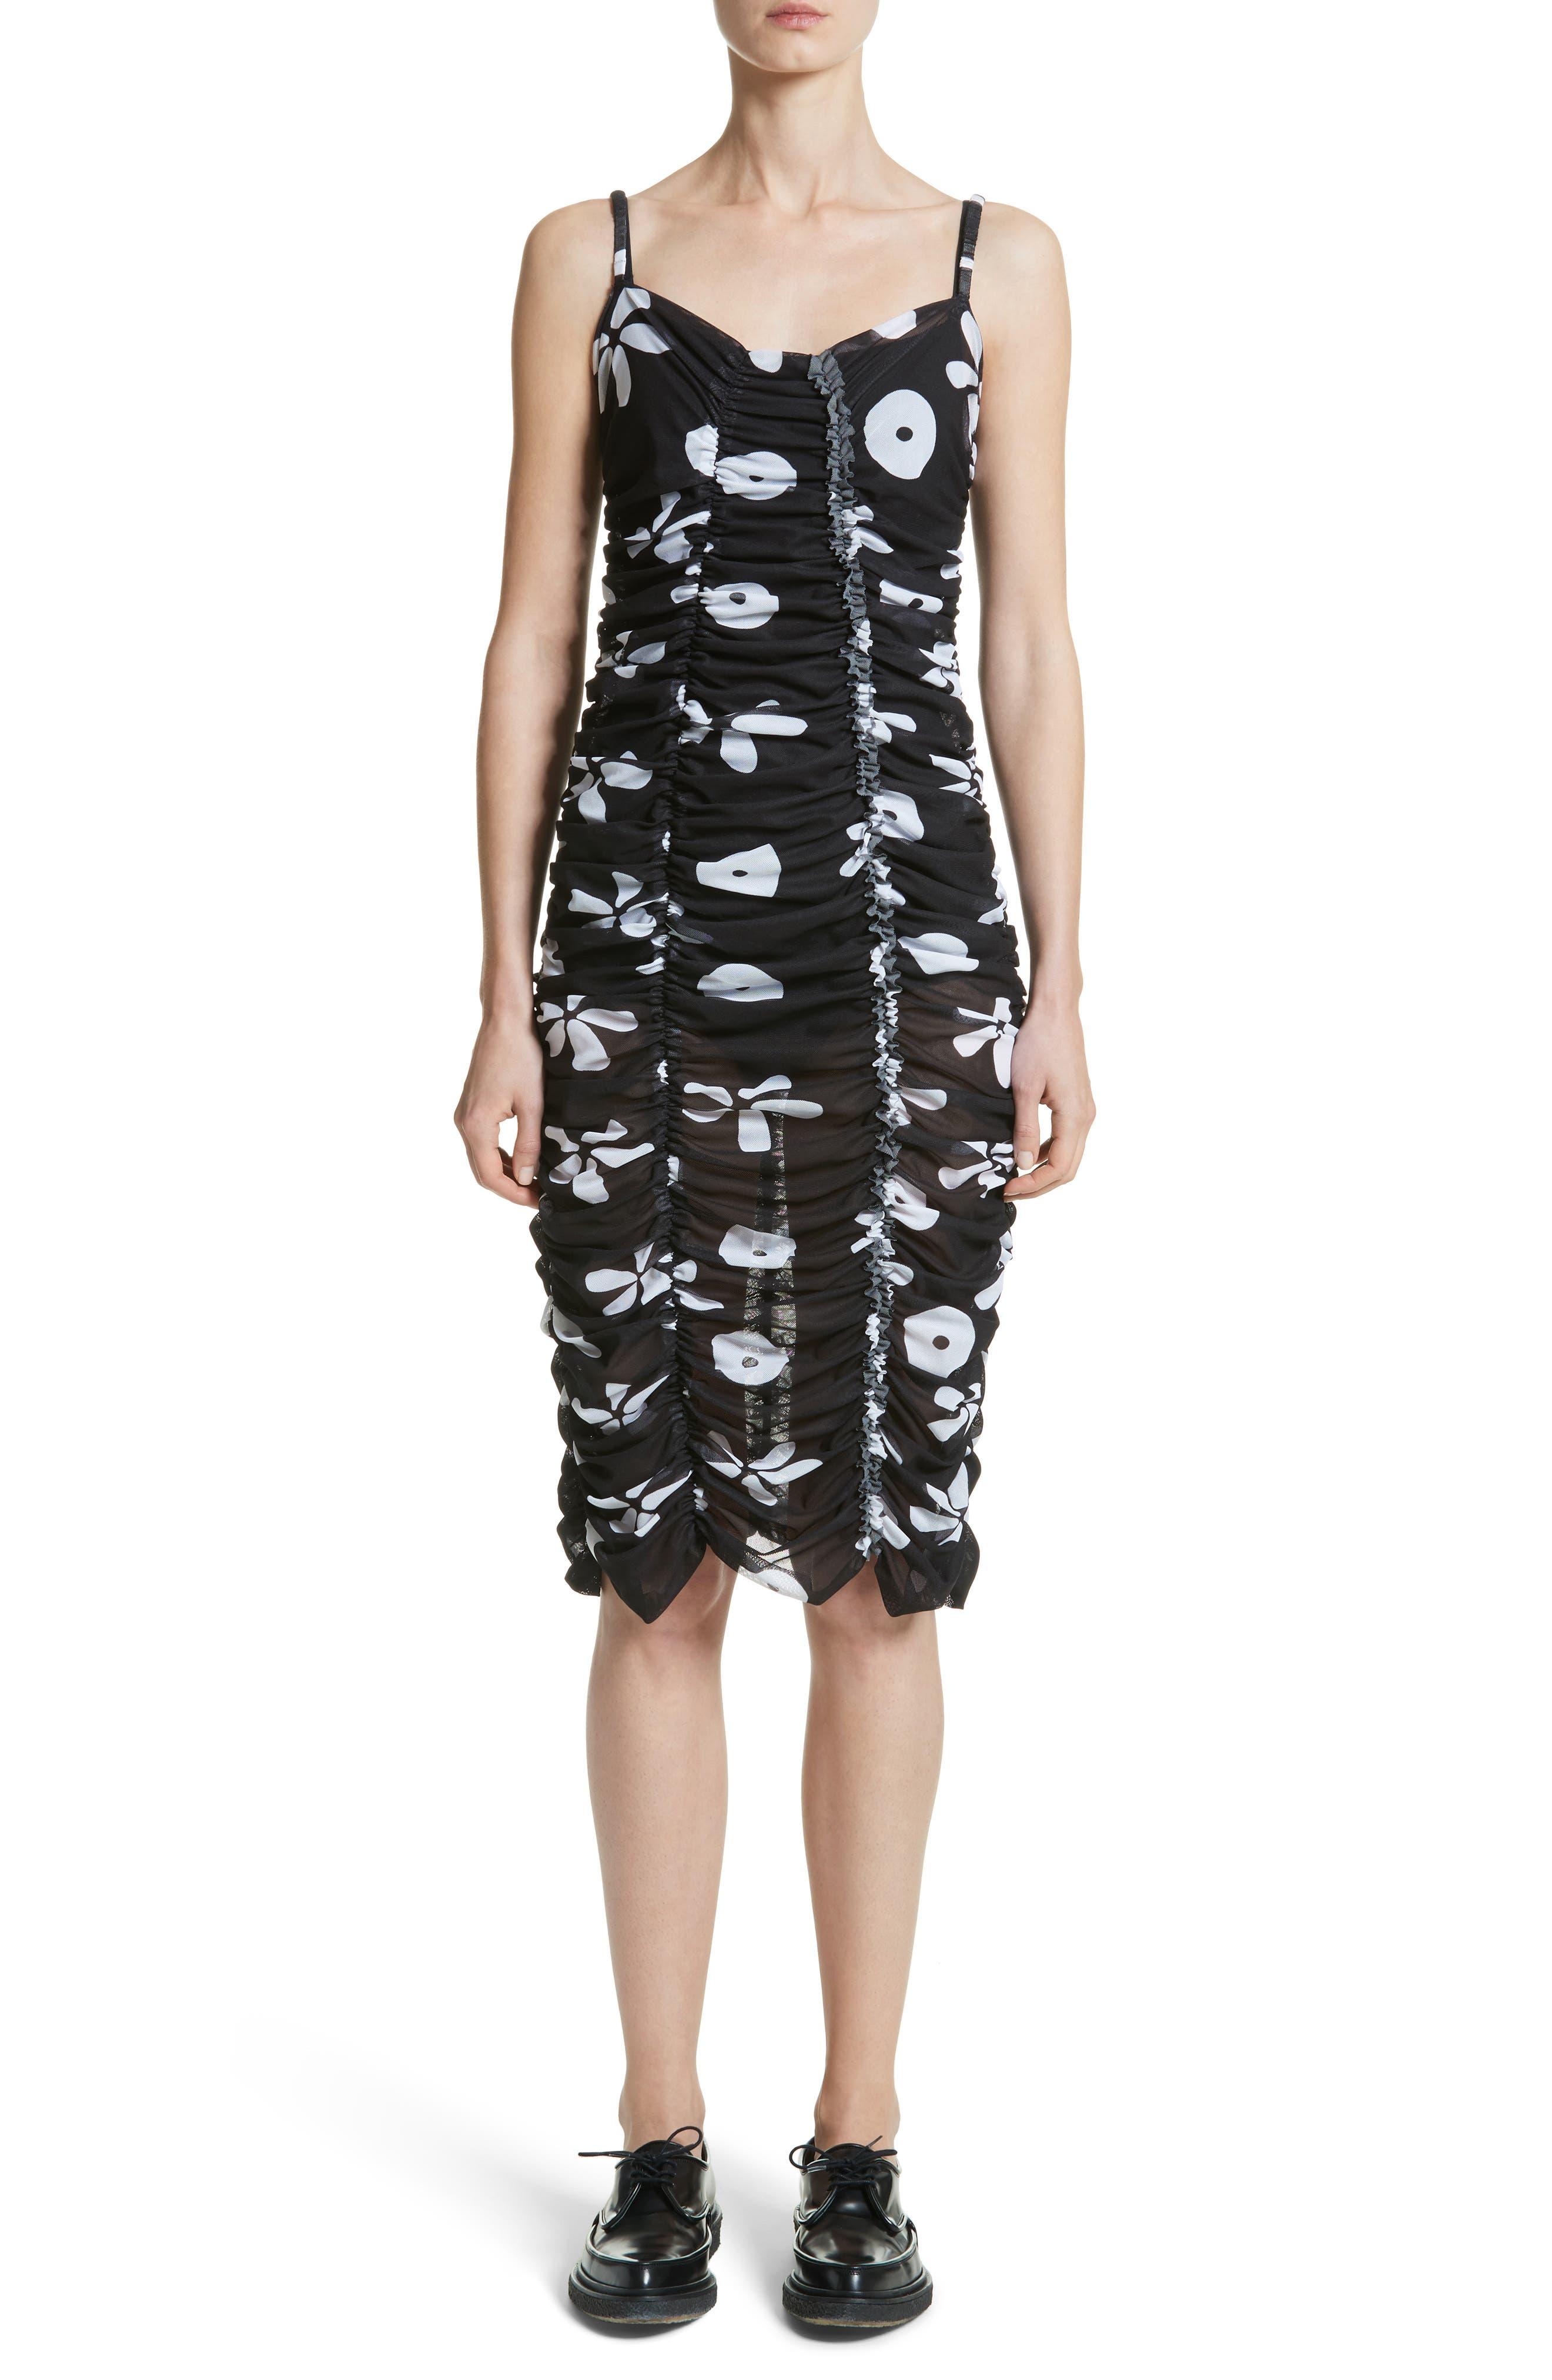 Molly Goddard Scarlett Floral Print Mesh Dress